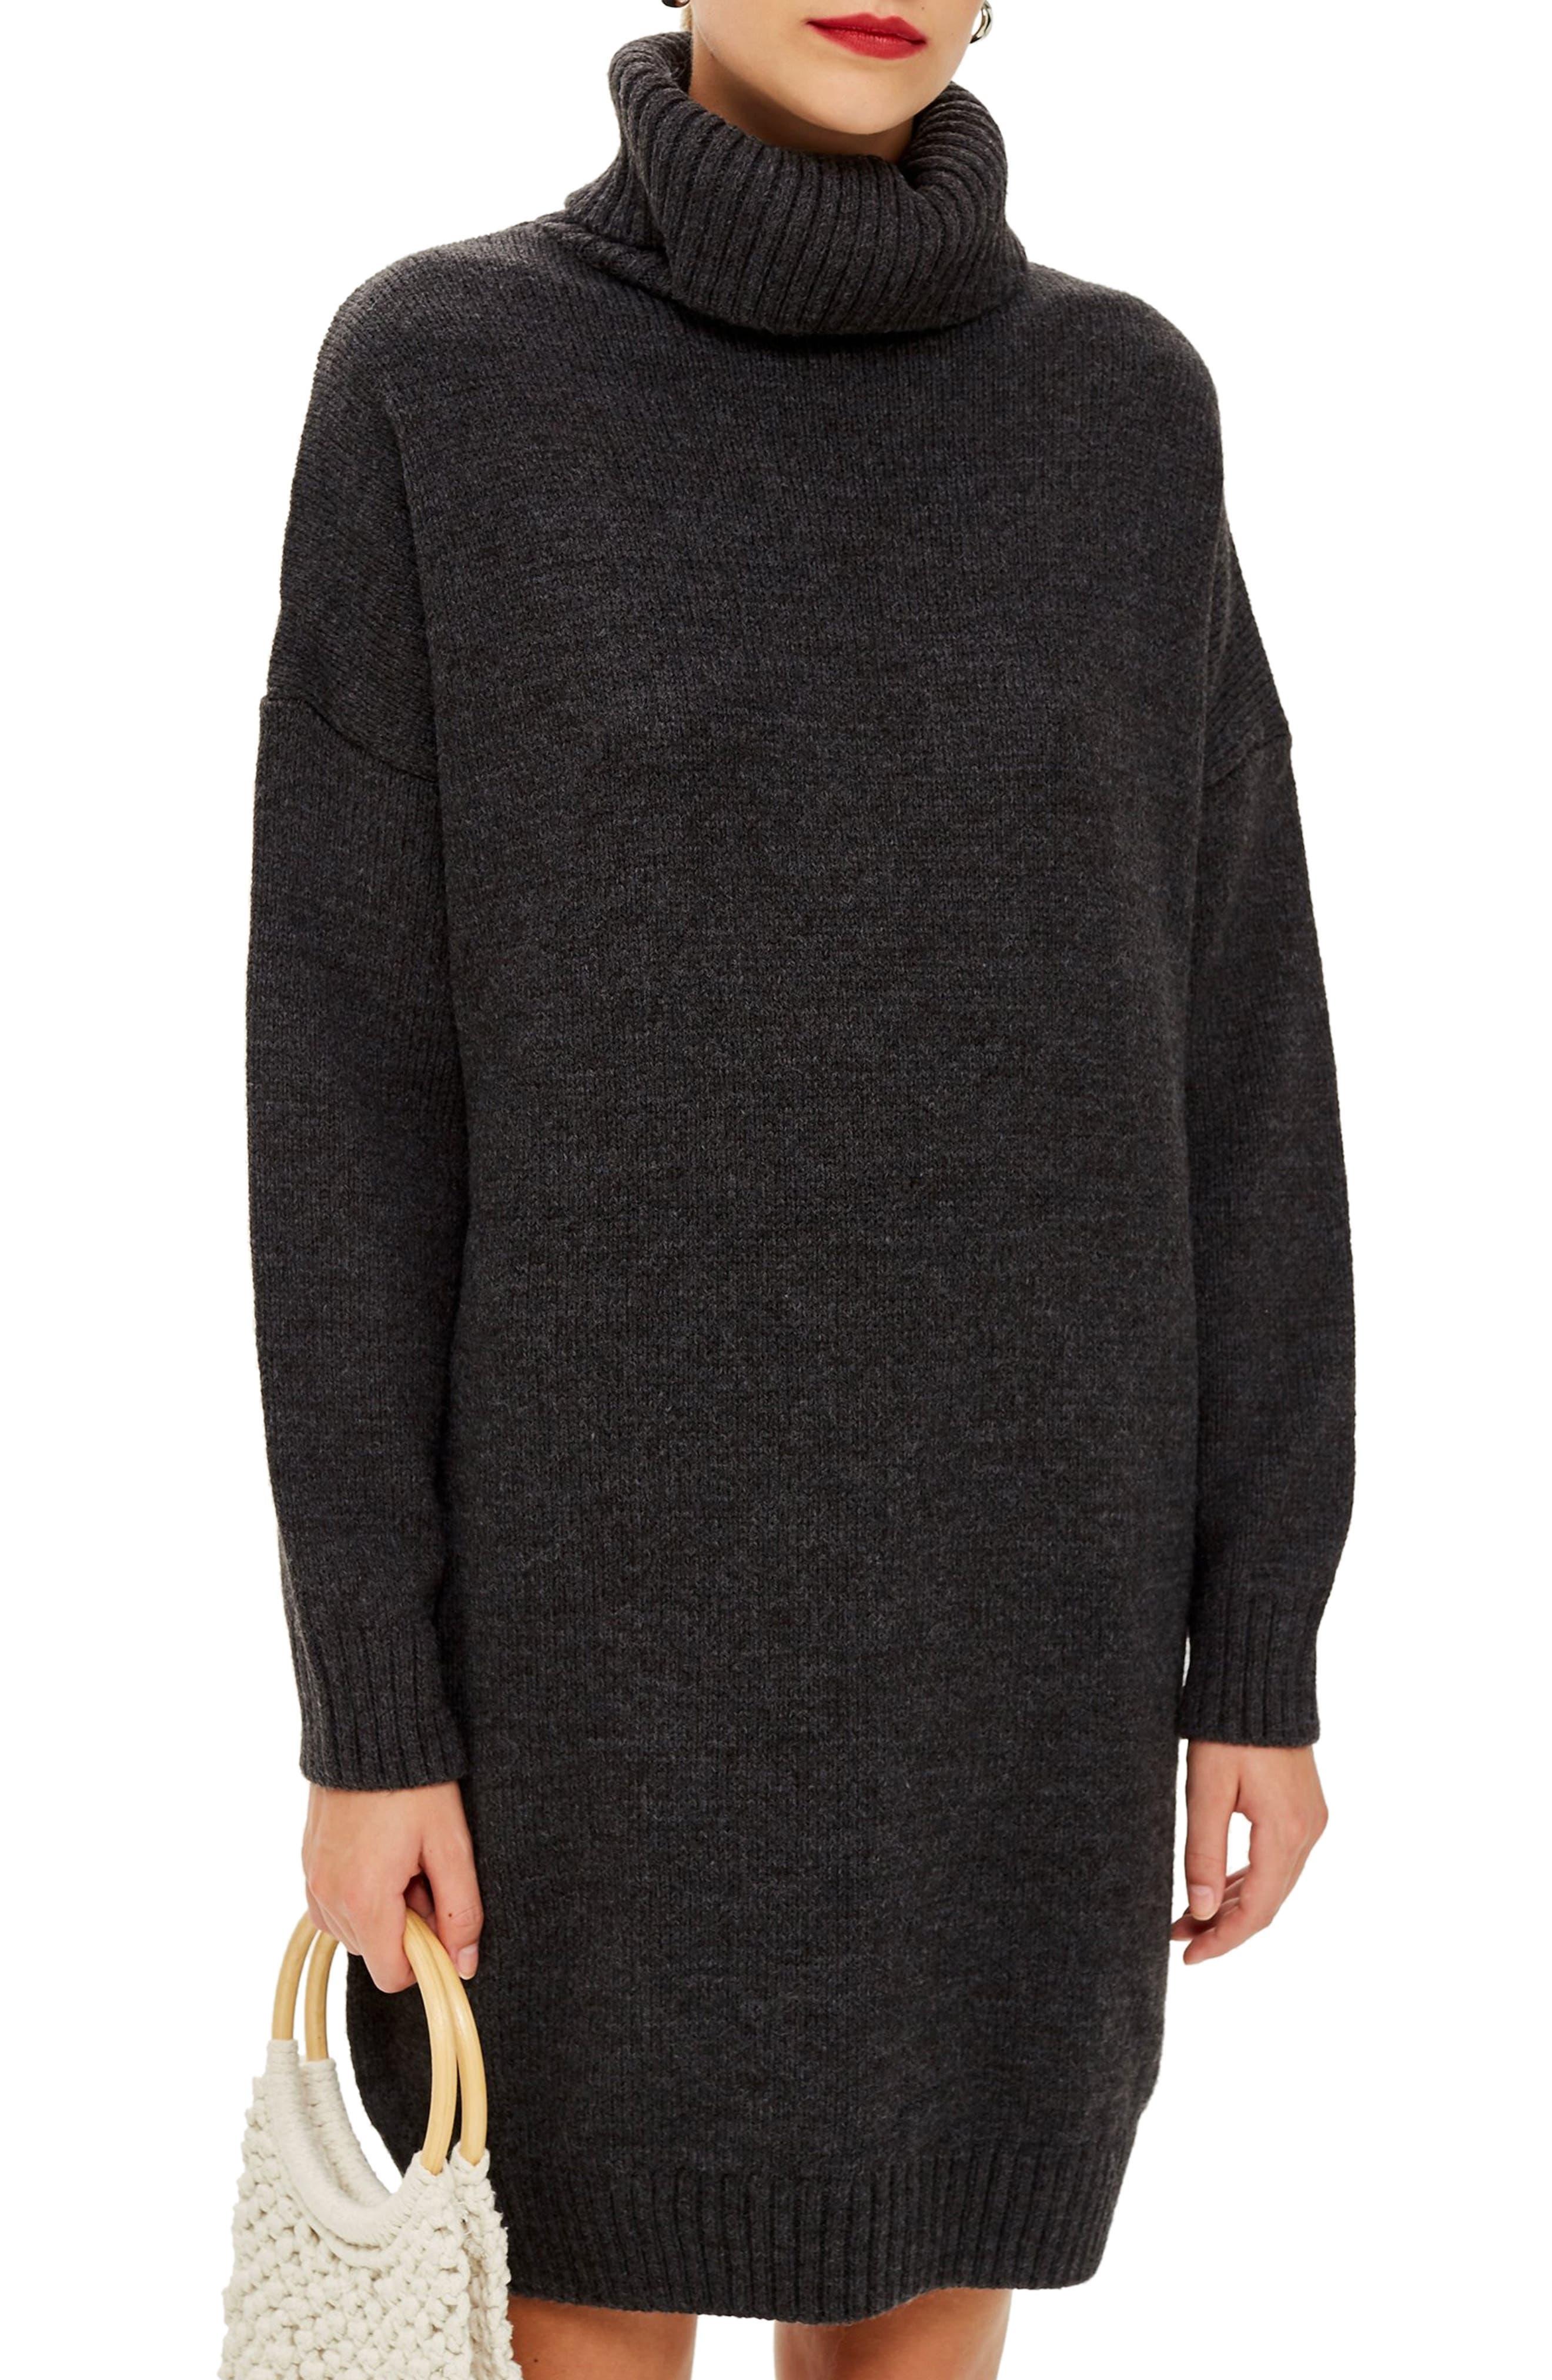 TOPSHOP Turtleneck Sweater Dress, Main, color, 021